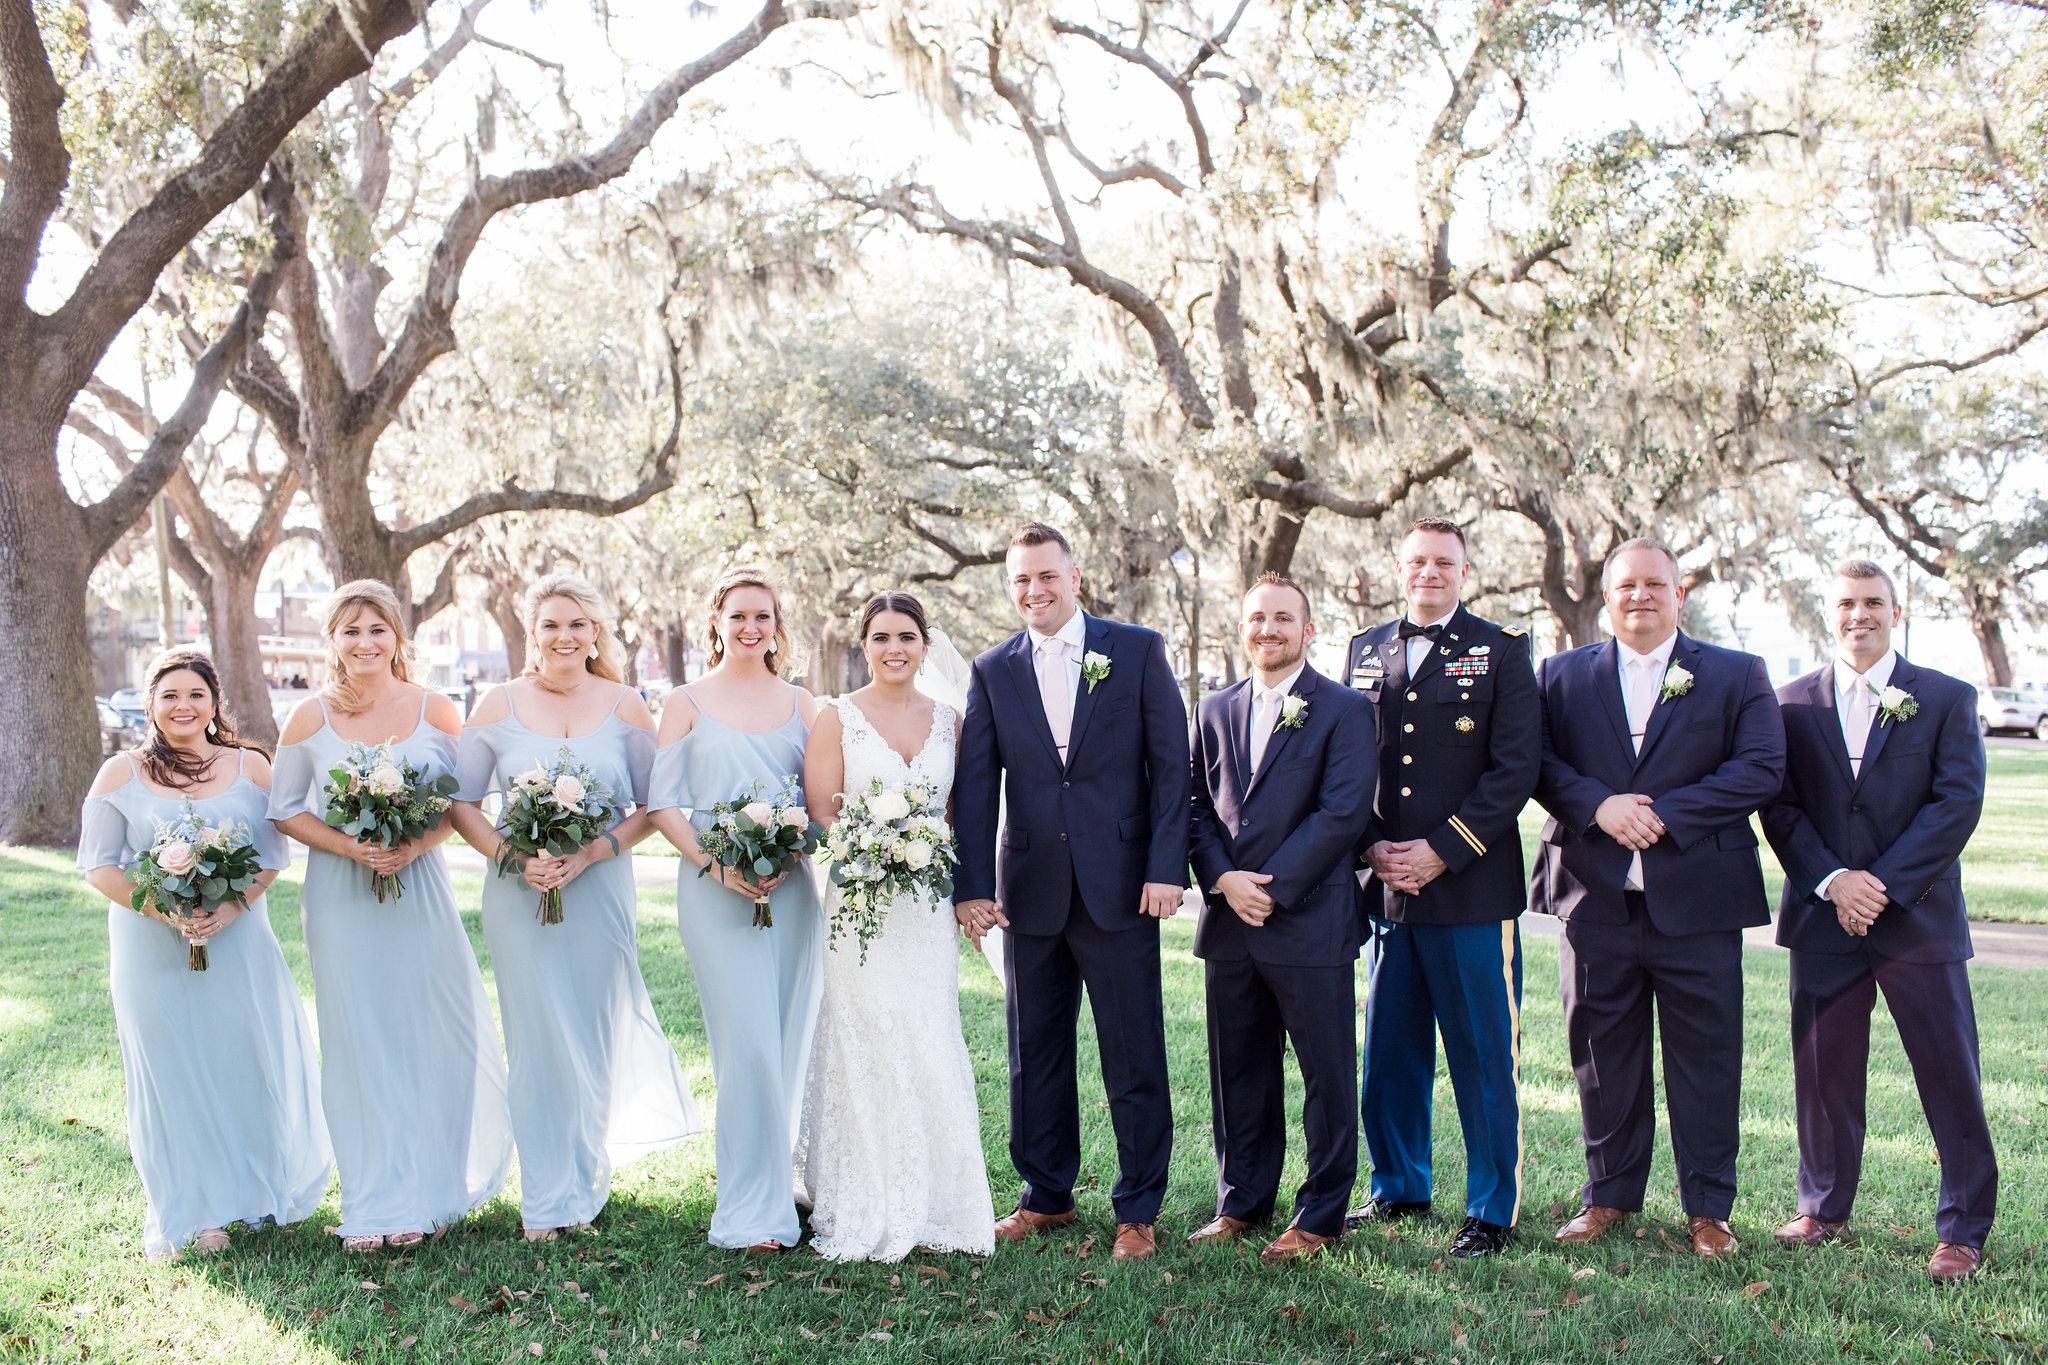 apt-b-photography-Savannah-wedding-photographer-savannah-engagement-photographer-historic-savannah-engagement-charles-h-morris-center-wedding-savannah-weddings-271.JPG